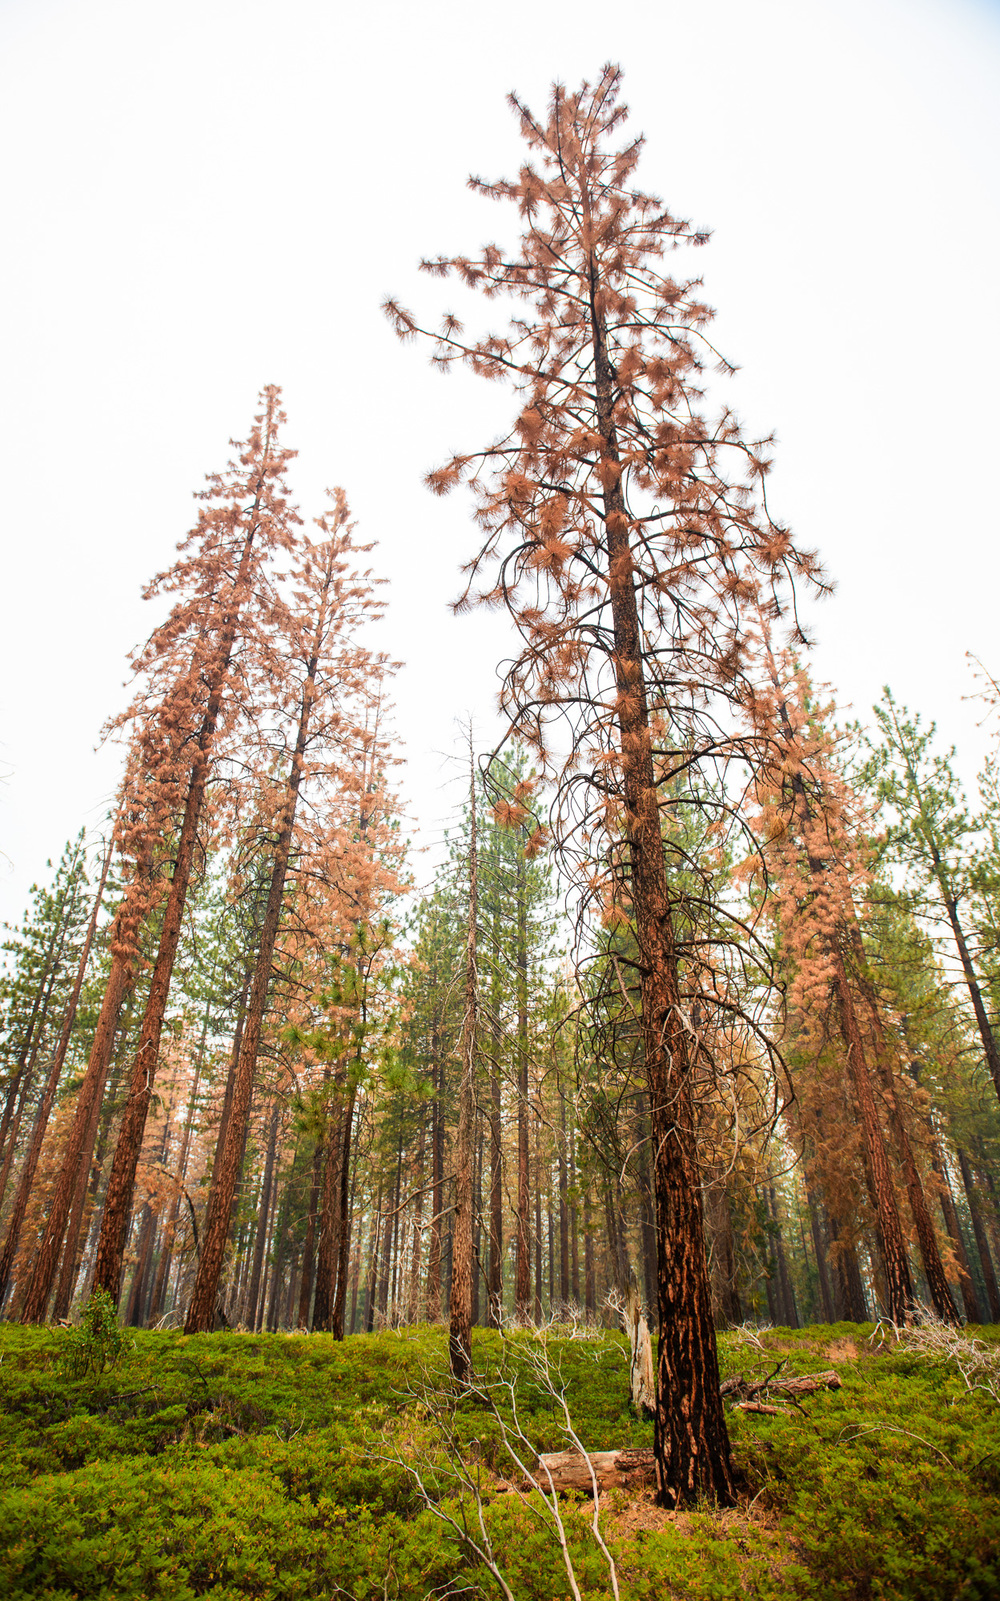 sierra_forest_dead_trees_brittany_app.jpg